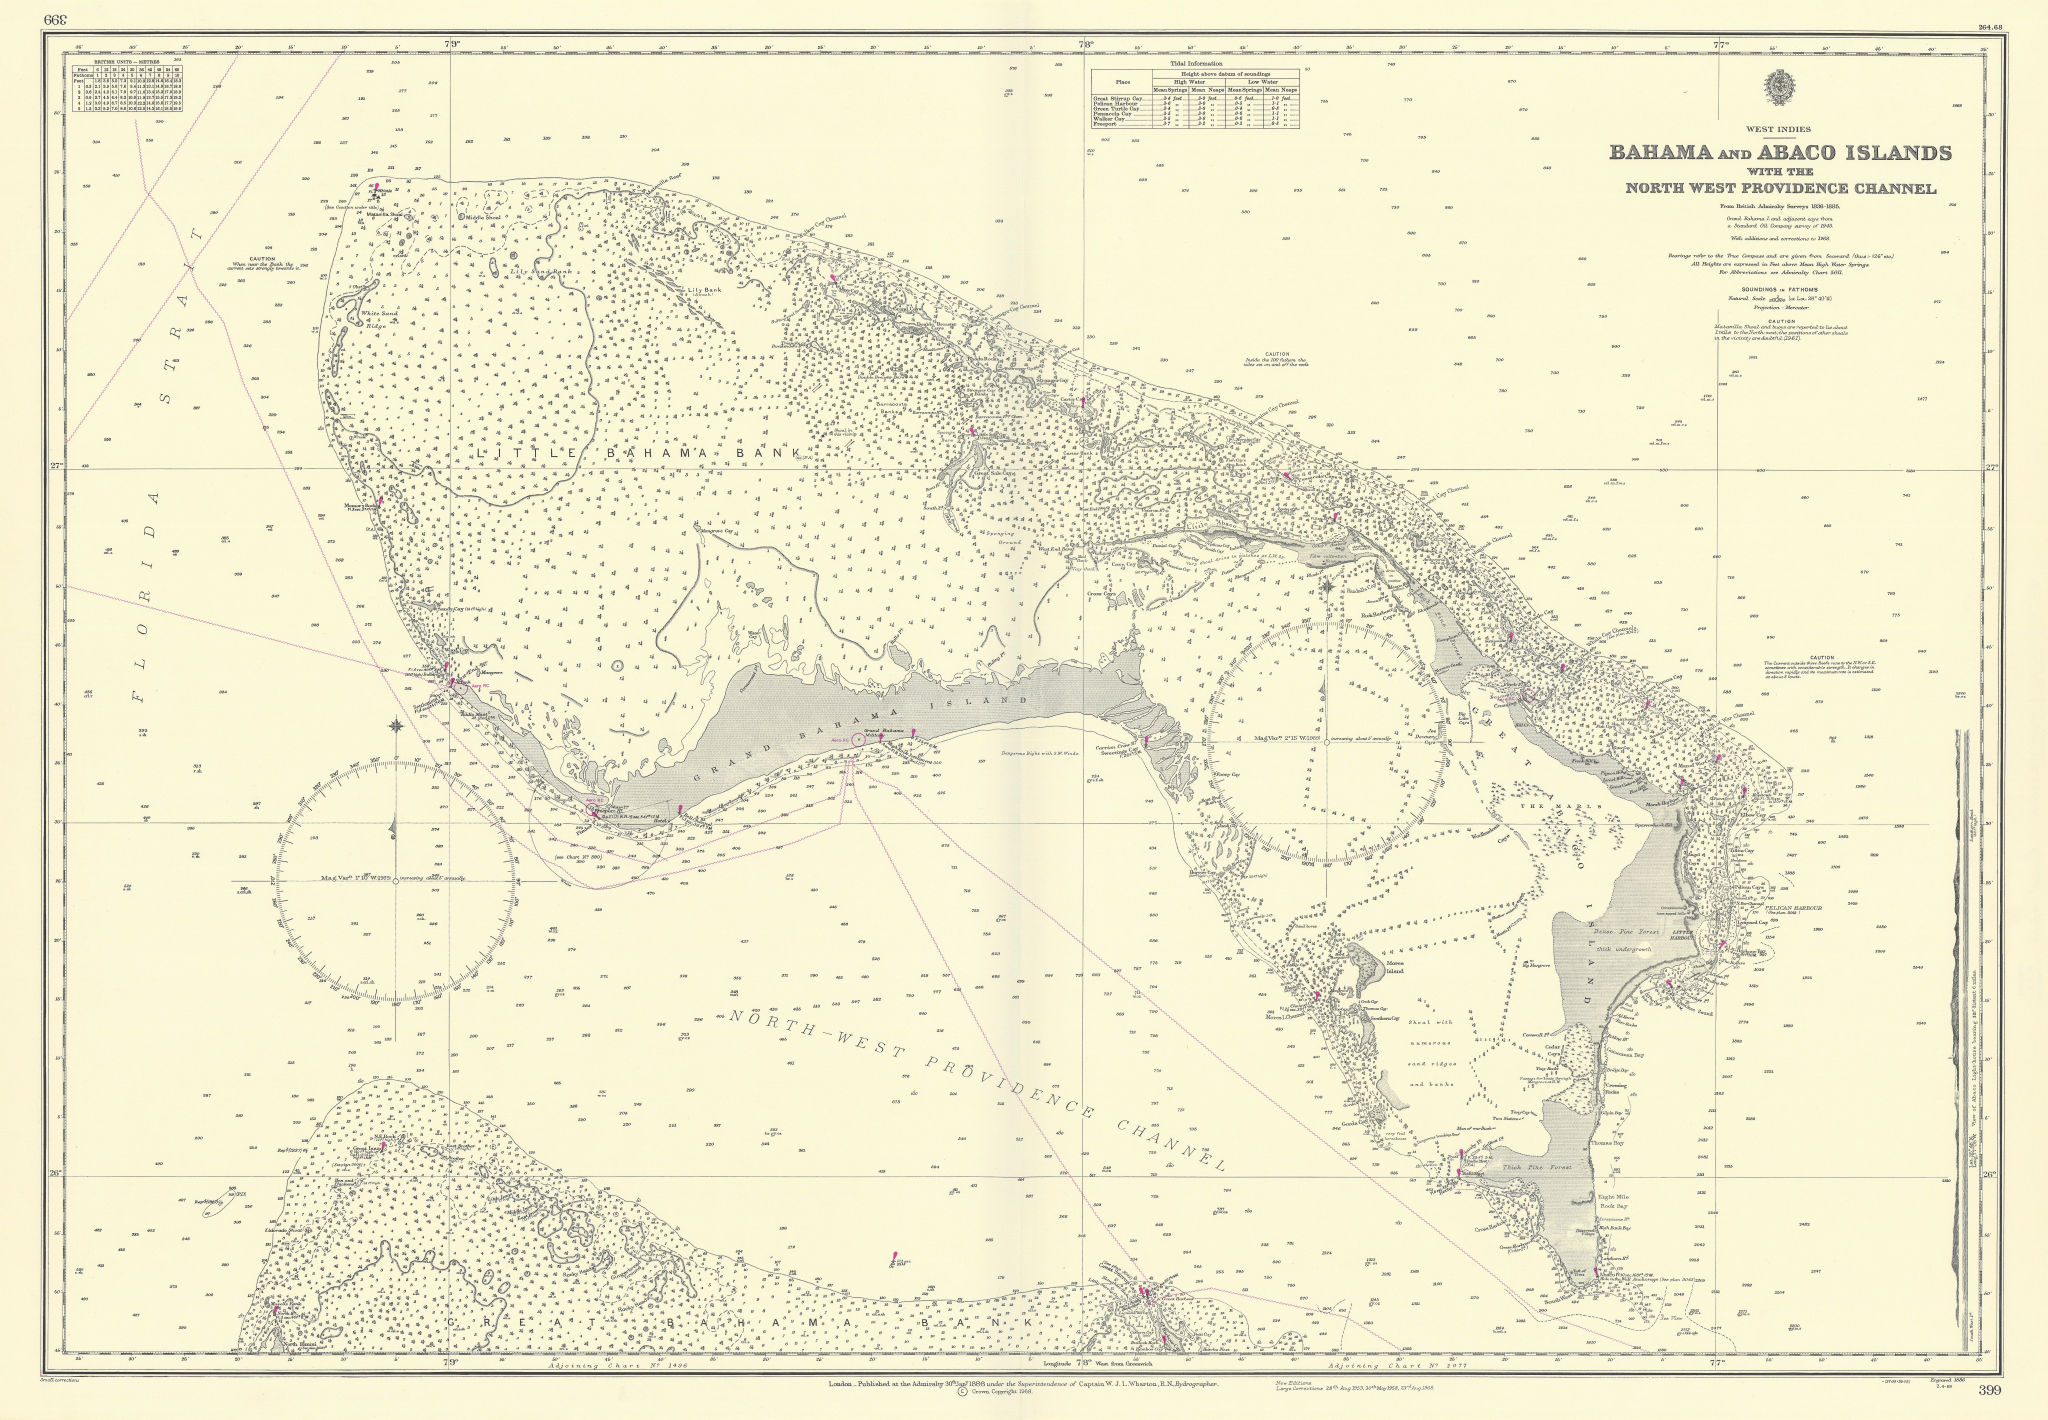 Grand Bahama & Great Abaco Islands. Bahamas. ADMIRALTY sea chart 1886 (1968) map